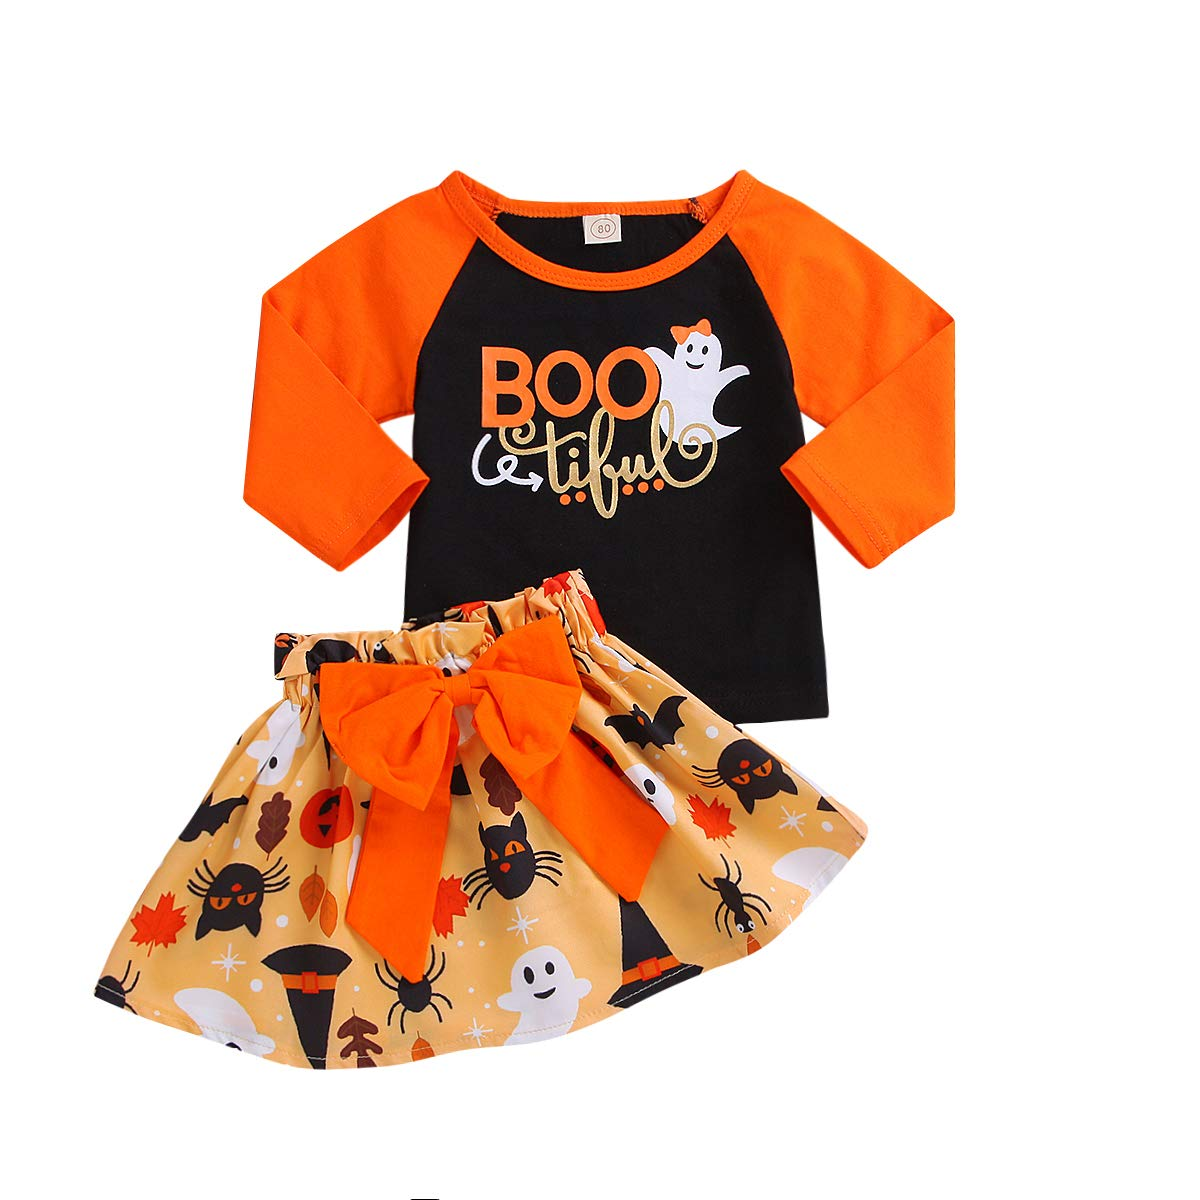 1-5T Halloween Costumes Little Girl Long Sleeve Sweatshirt + Bowknot Skirt Set Baby Girl Fall Outfits My First Halloween